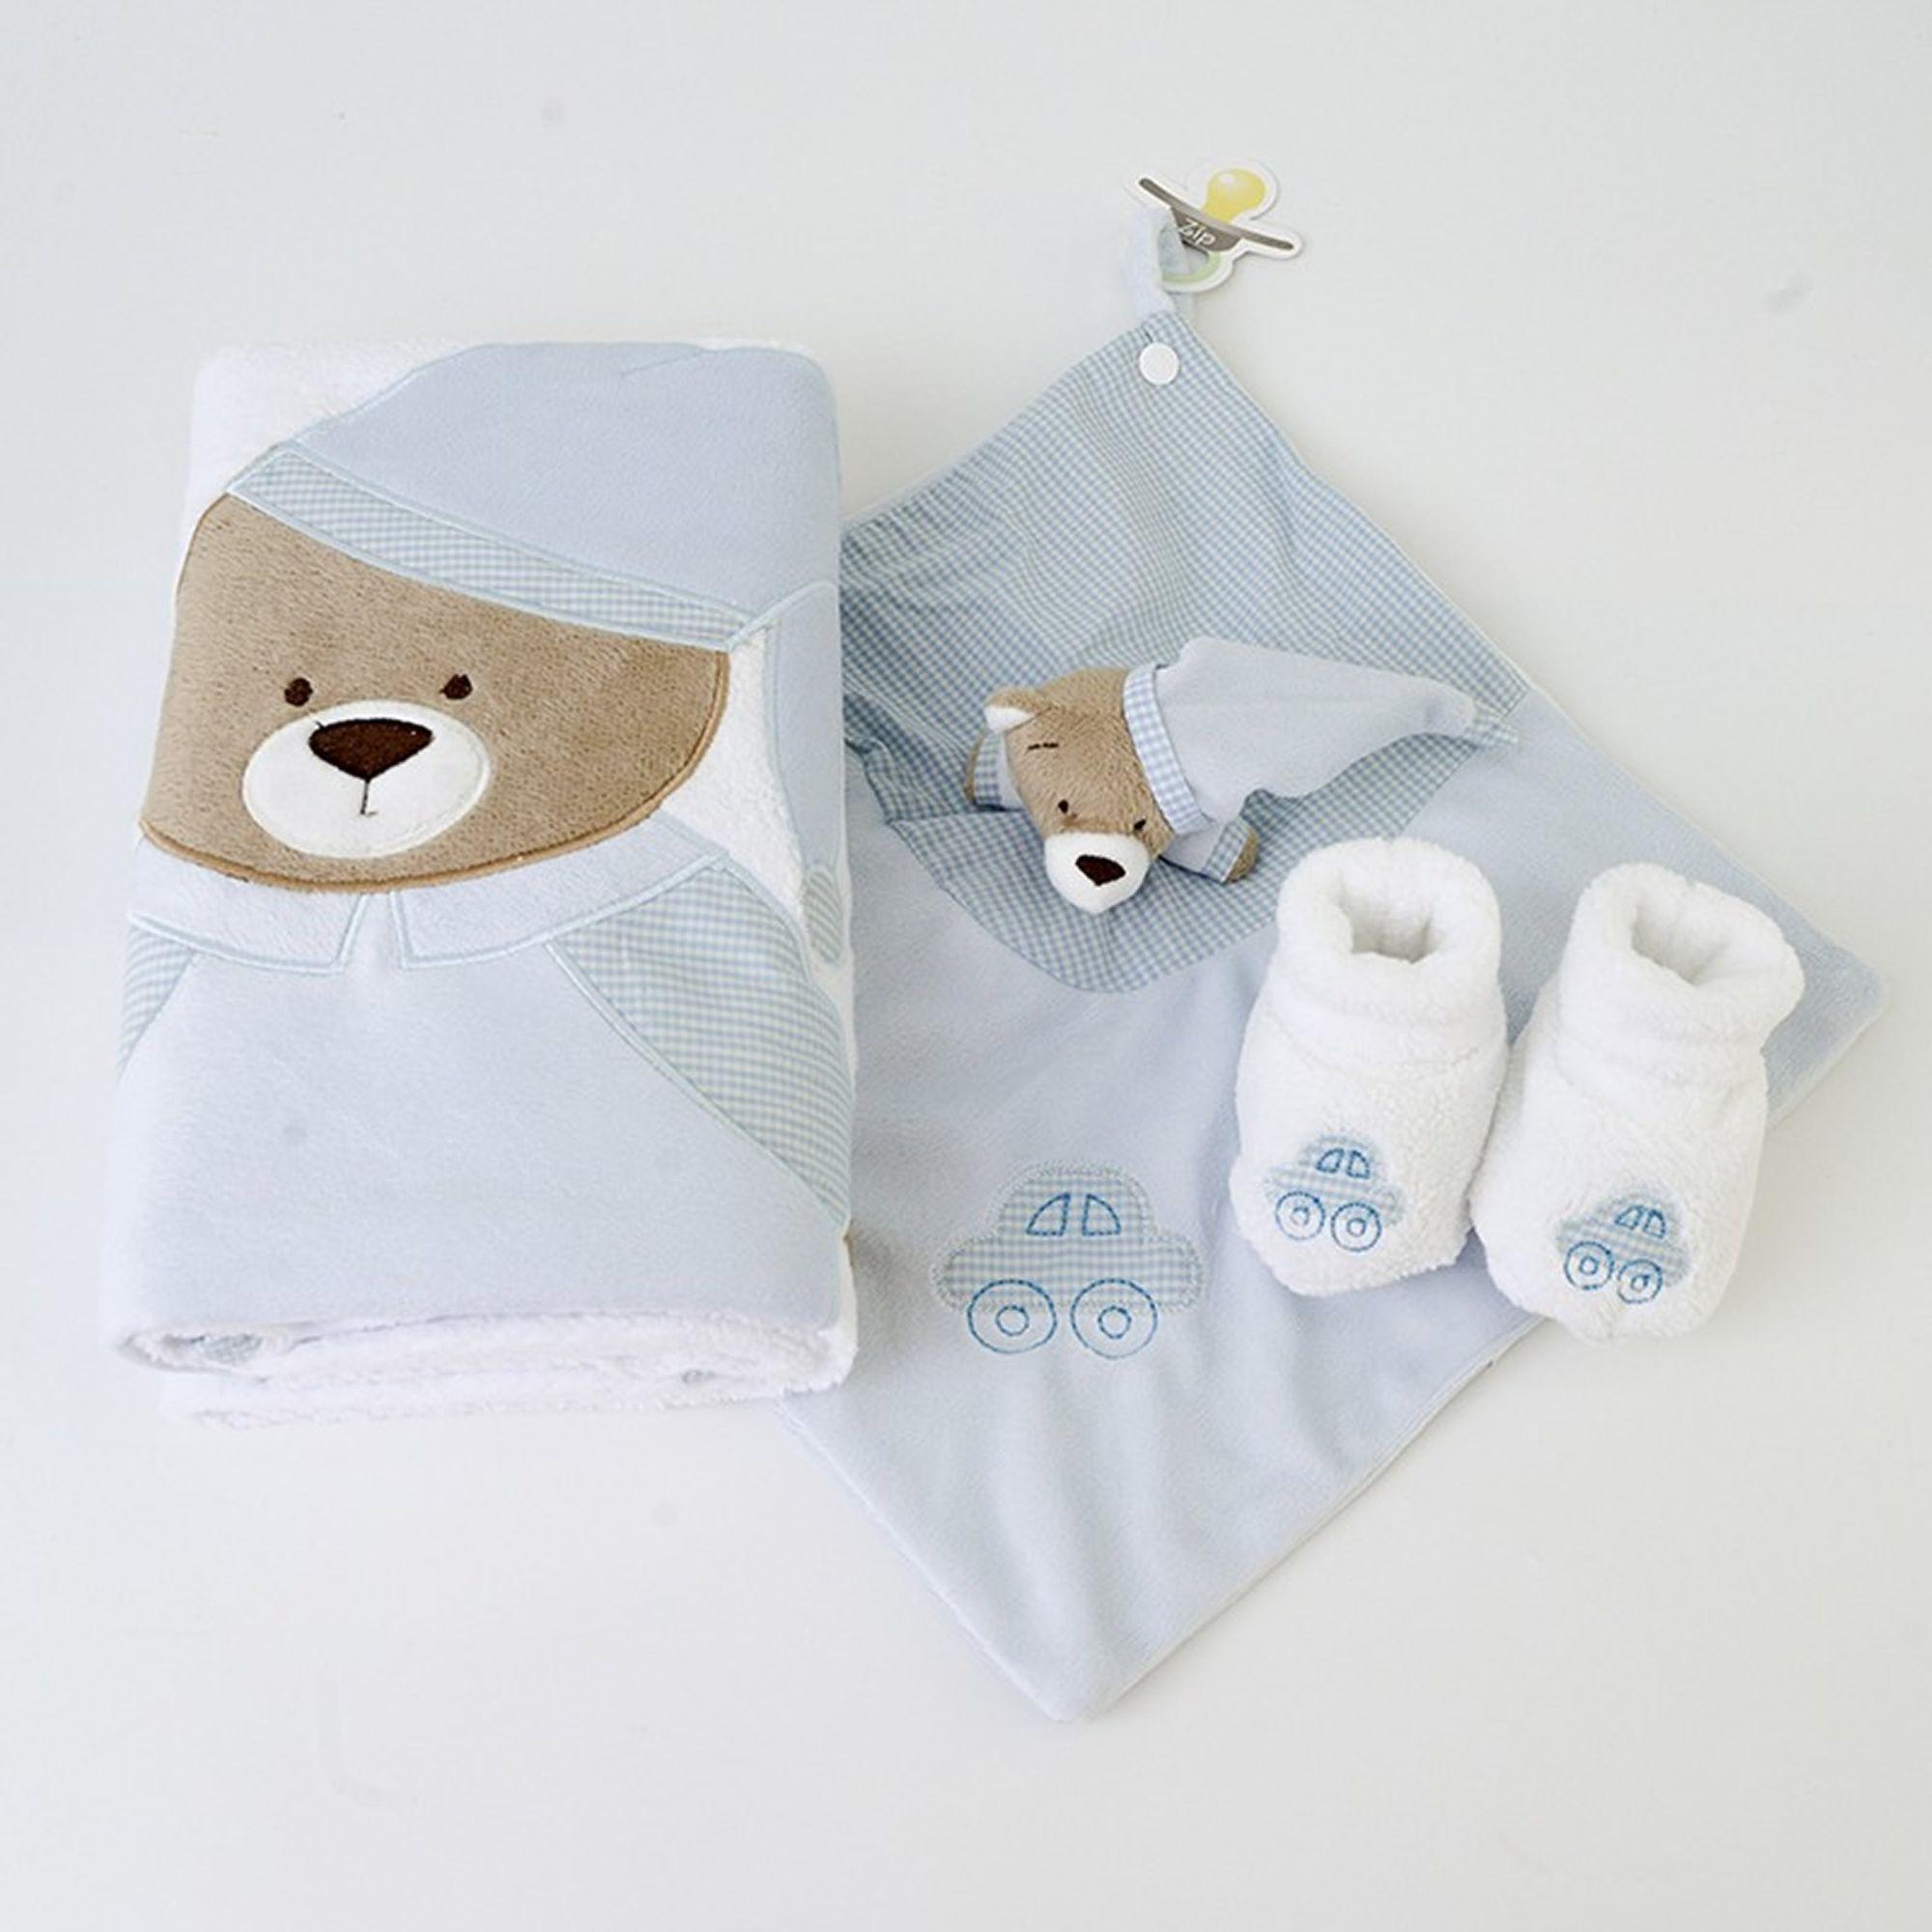 kit-presente-bebes-urso-nino-azul-zip-toys-1